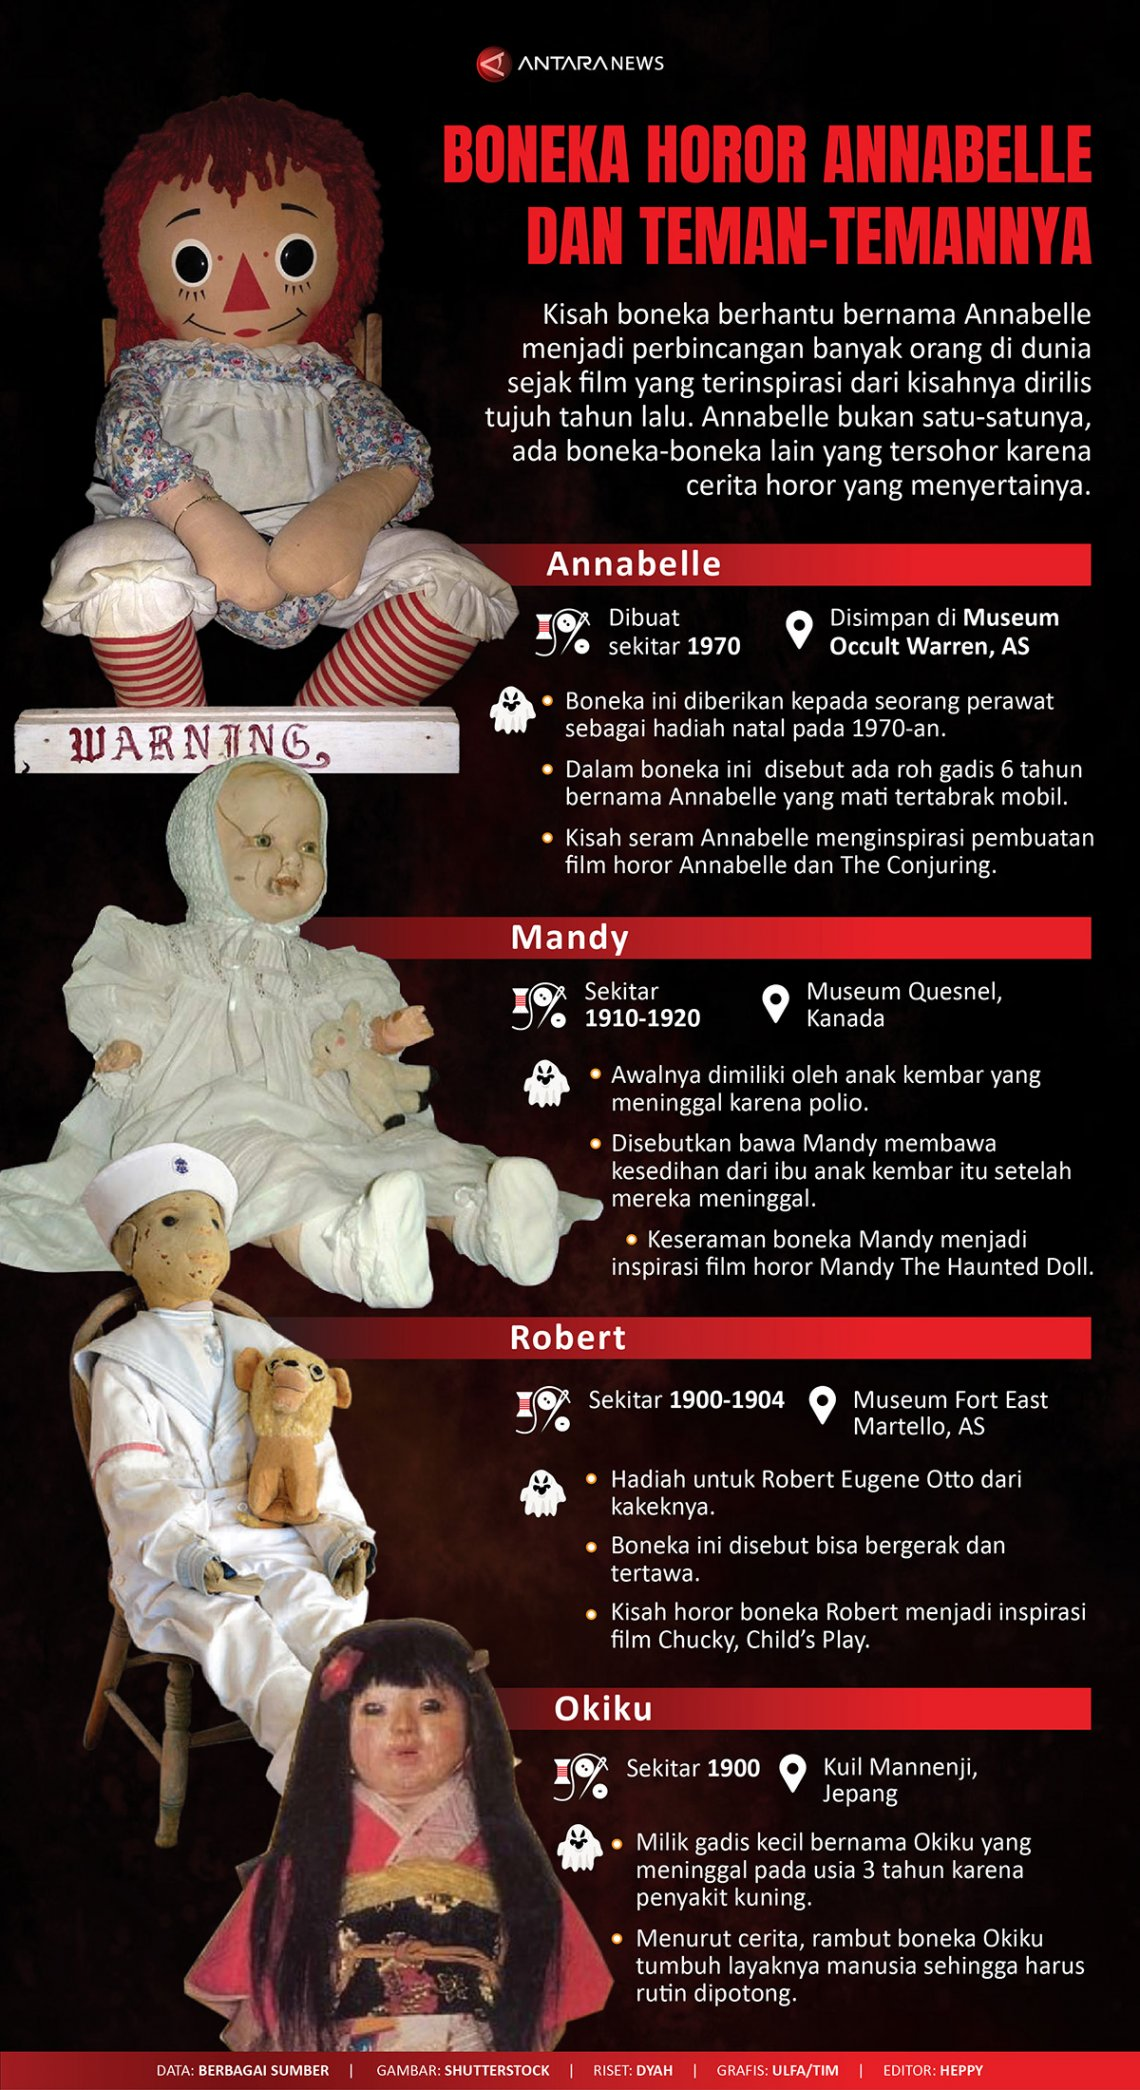 Boneka horor Annabelle dan teman-temannya